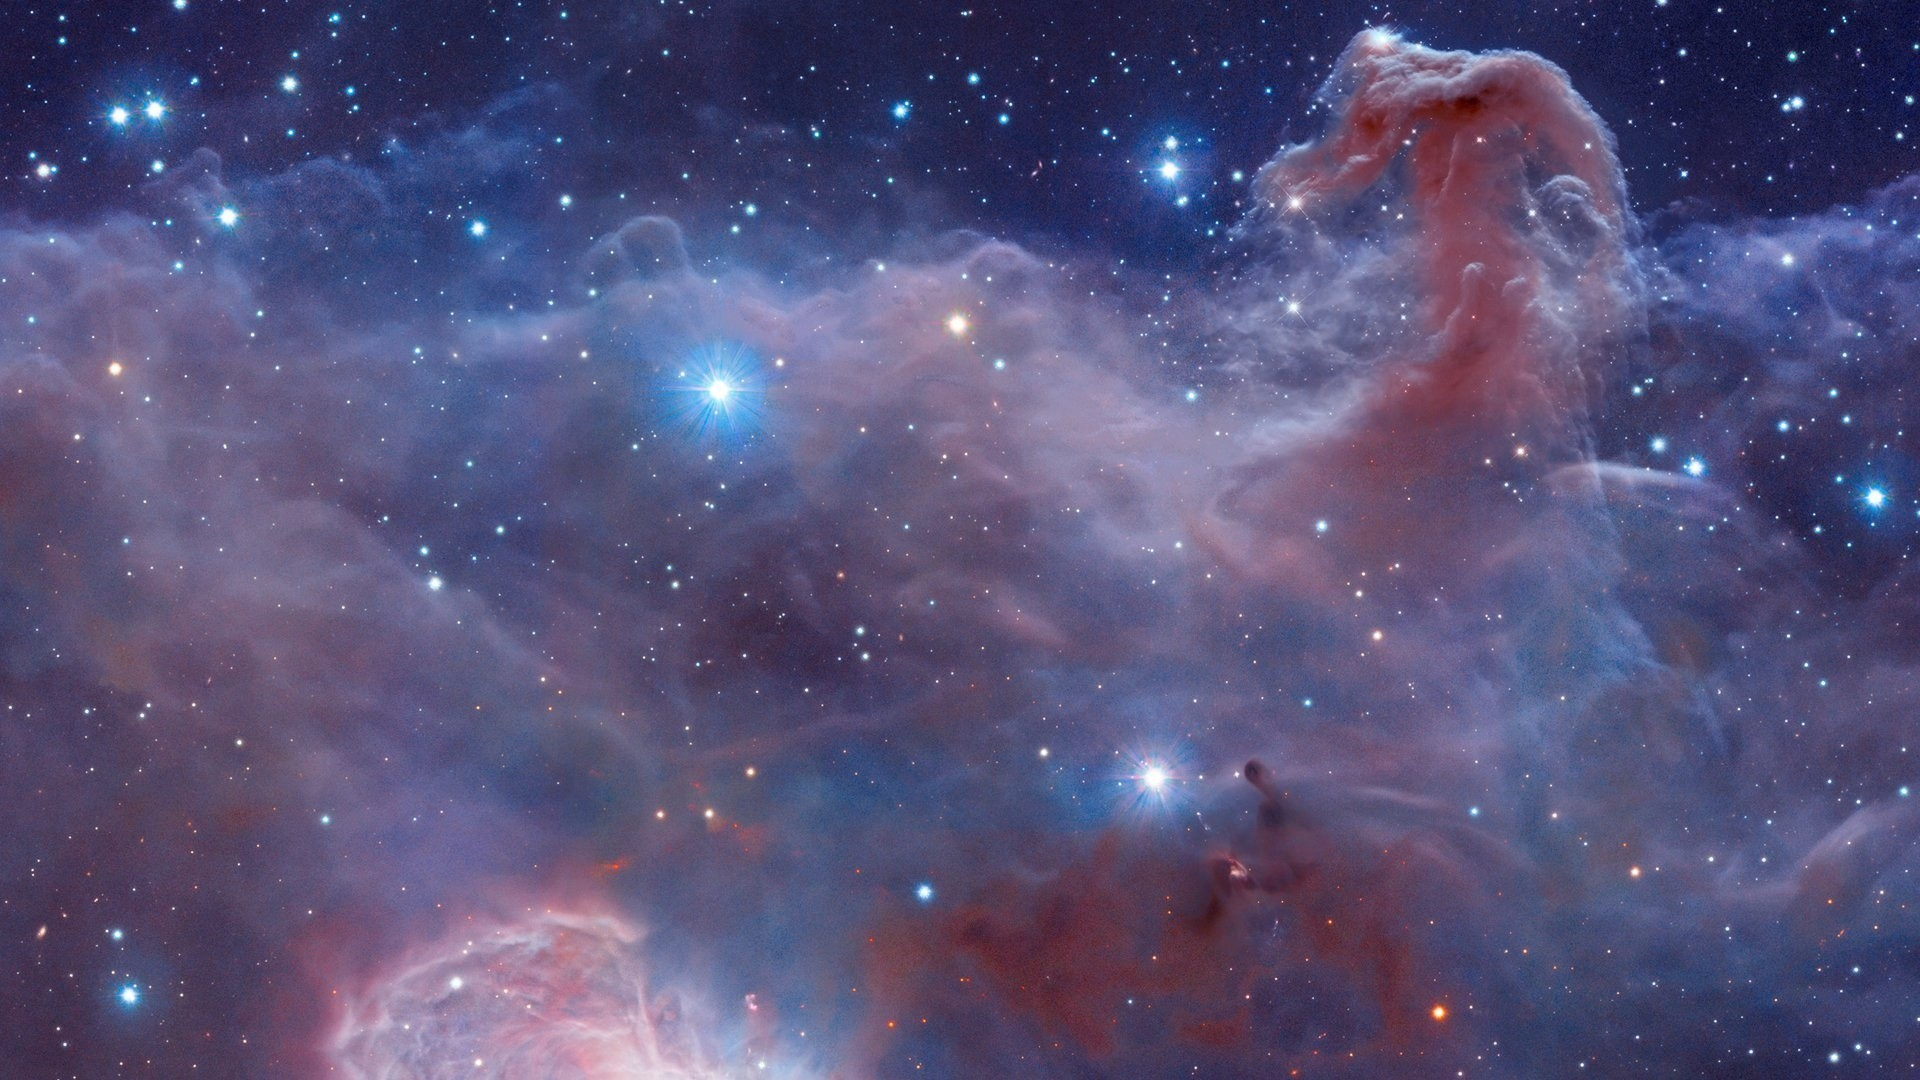 Wallpaper horsehead nebula, barnard 33, nebula, orion, space desktop .